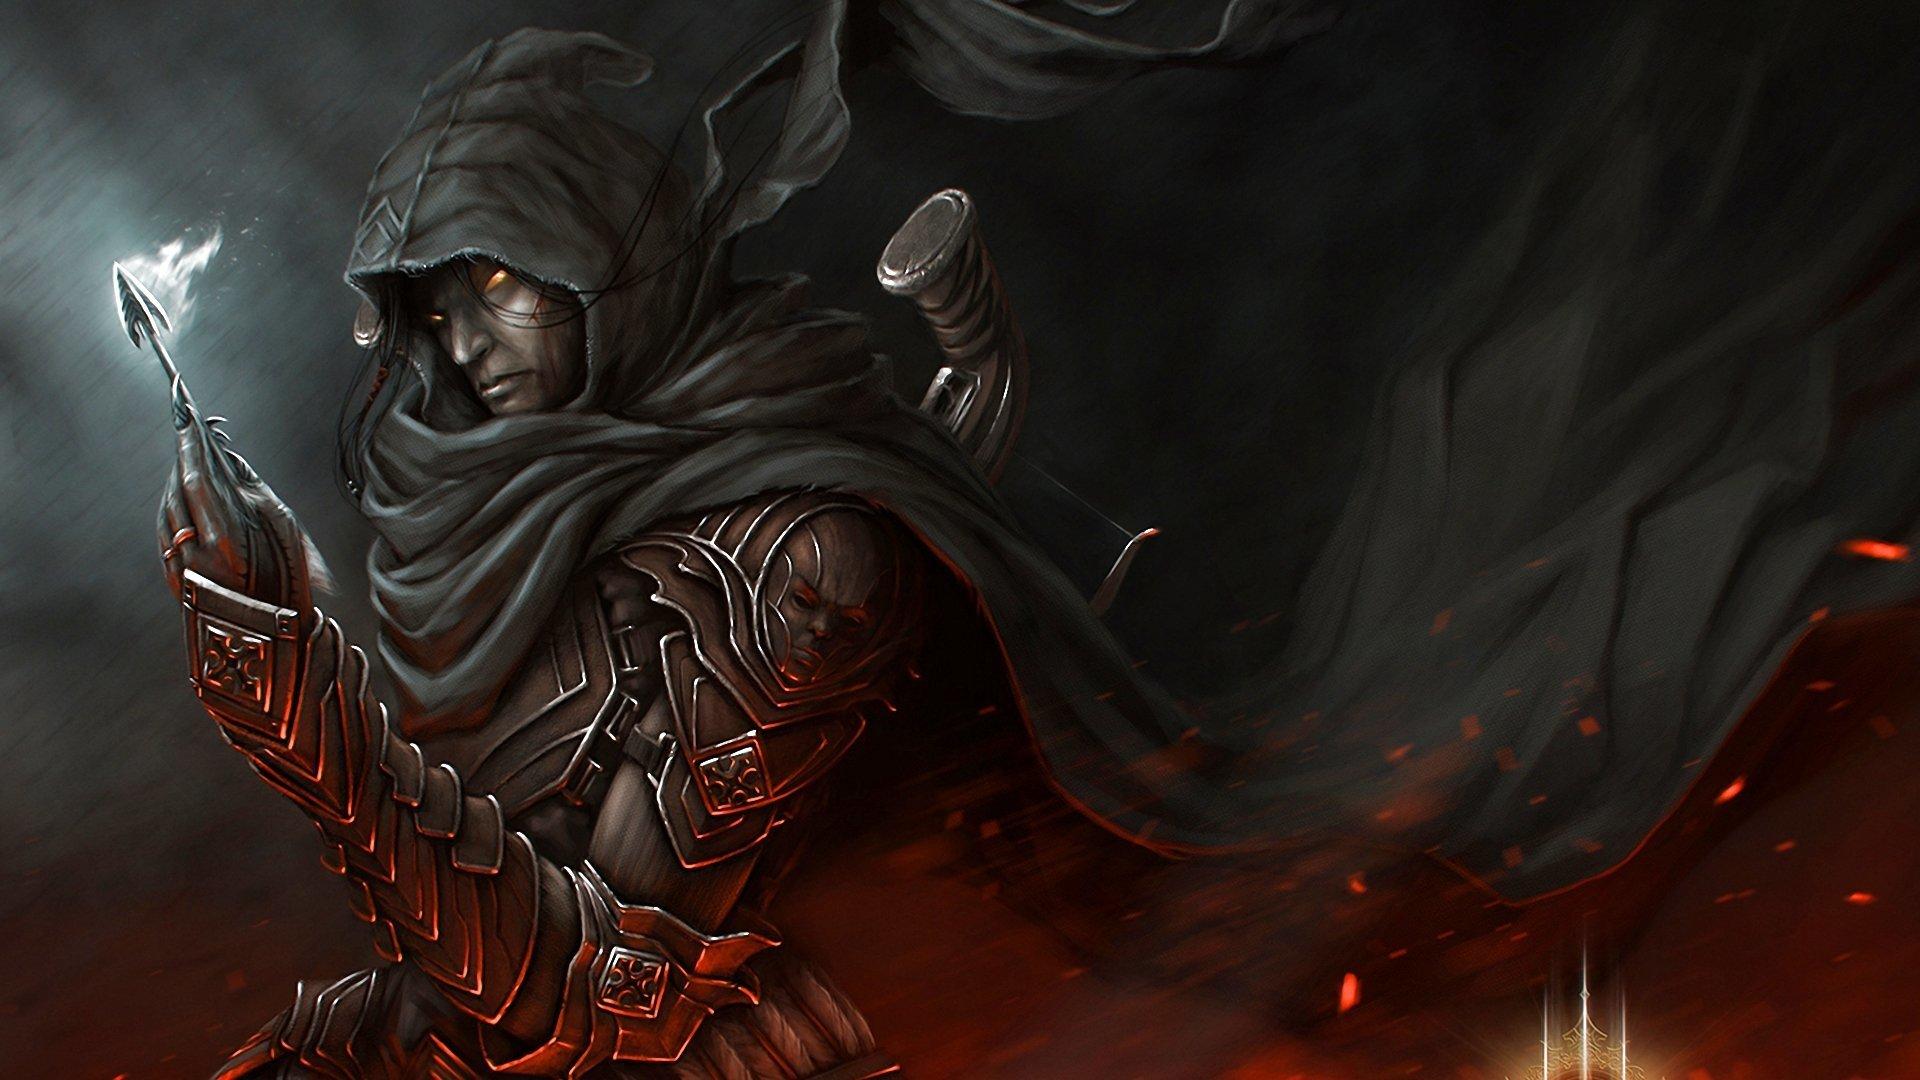 Diablo Iii Hd Wallpaper Background Image 1920x1080 Id 704505